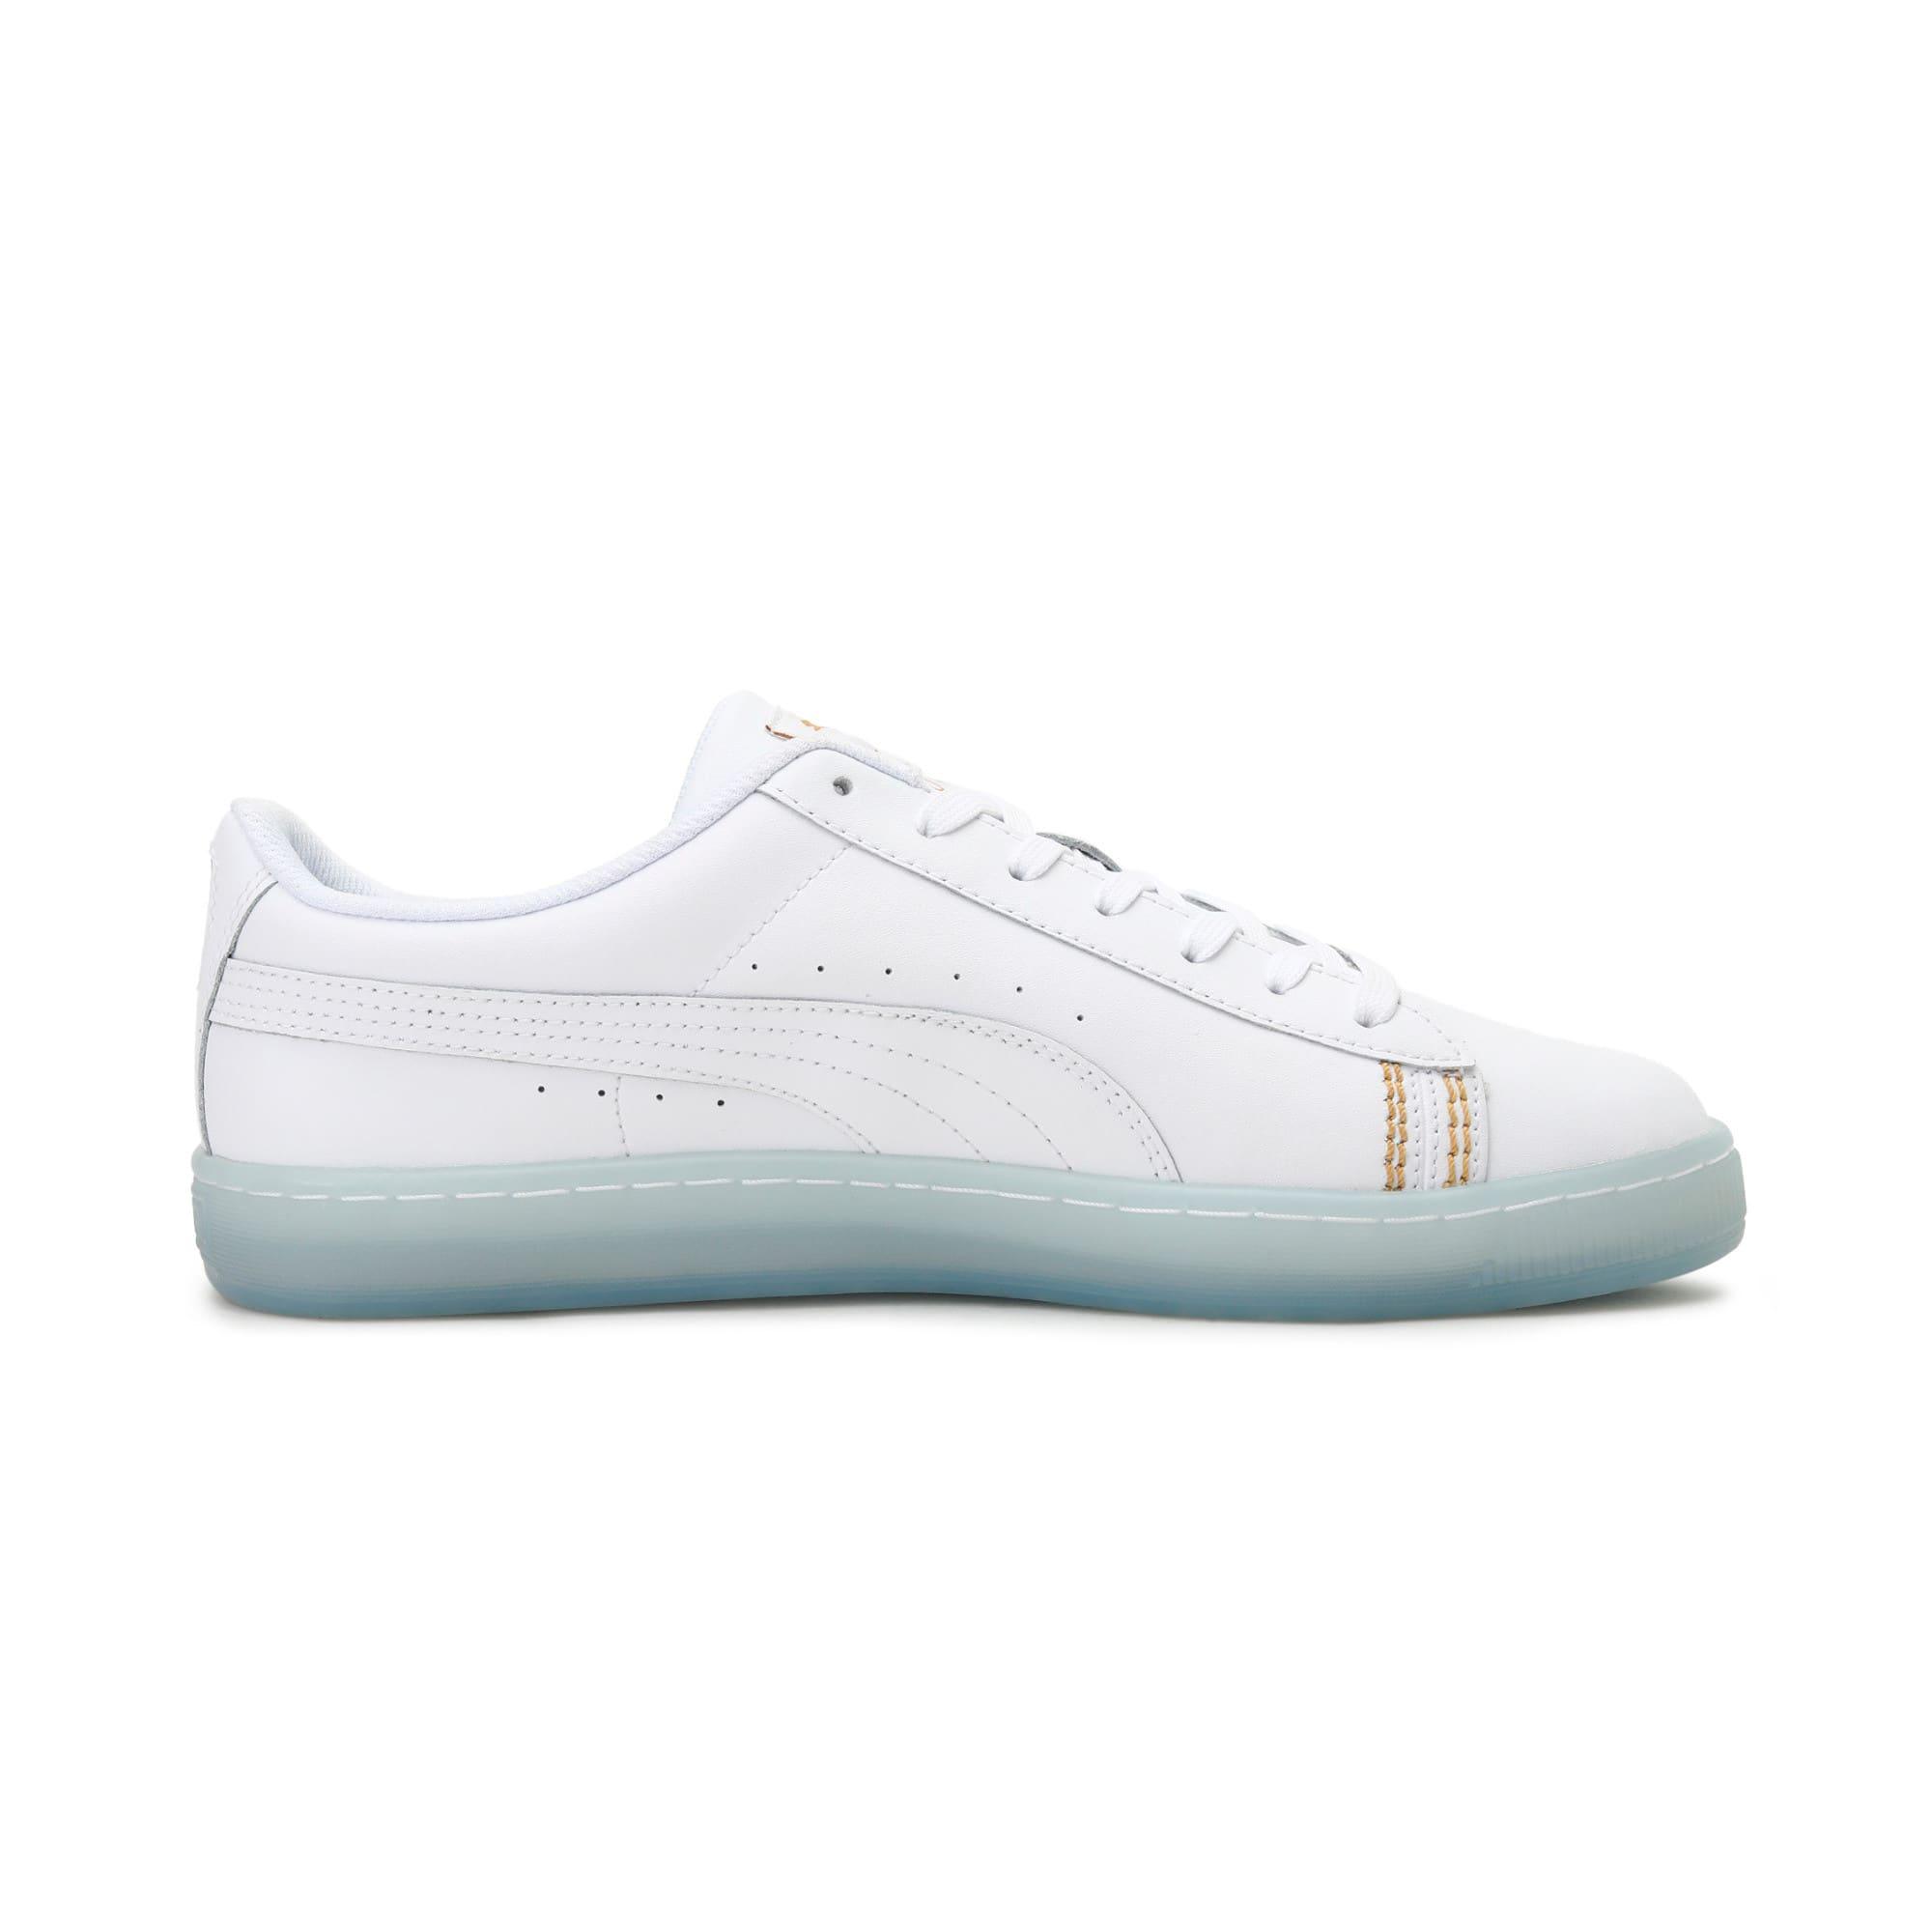 Thumbnail 5 of Basket Classic one8 Unisex Sneakers, White-Team Gold-Bleu Azur, medium-IND